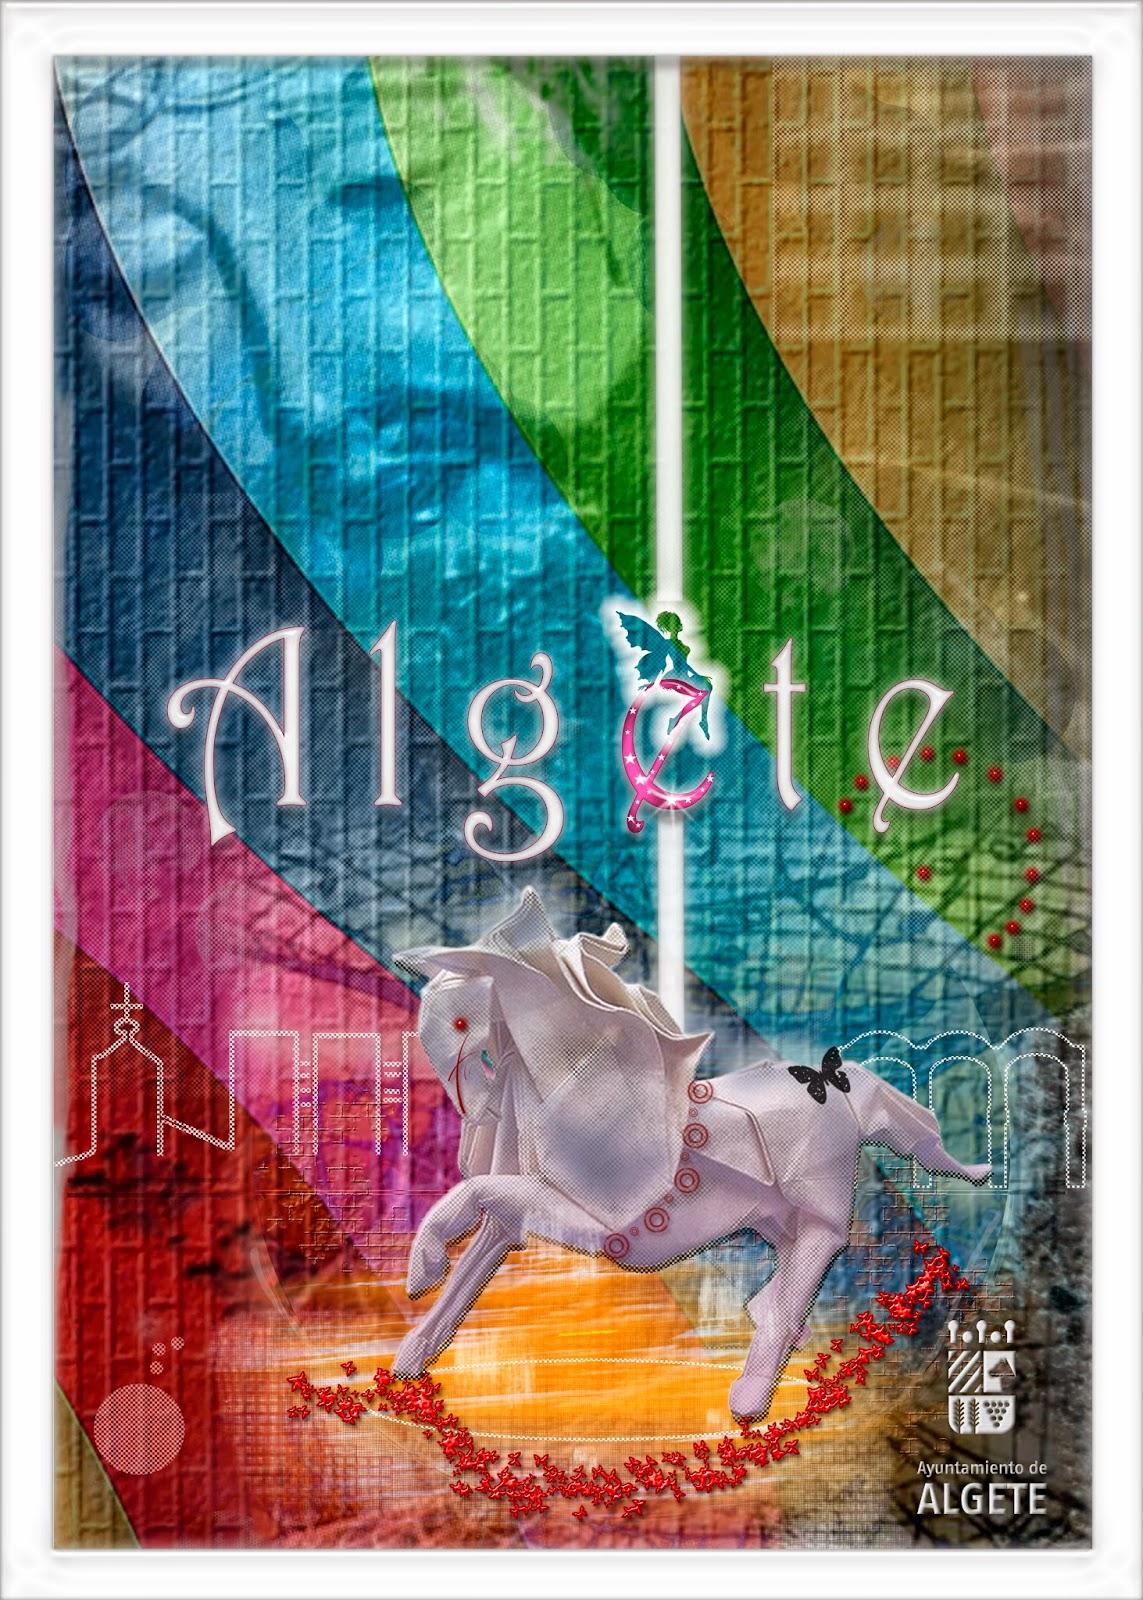 Fiestas de Algete 2014